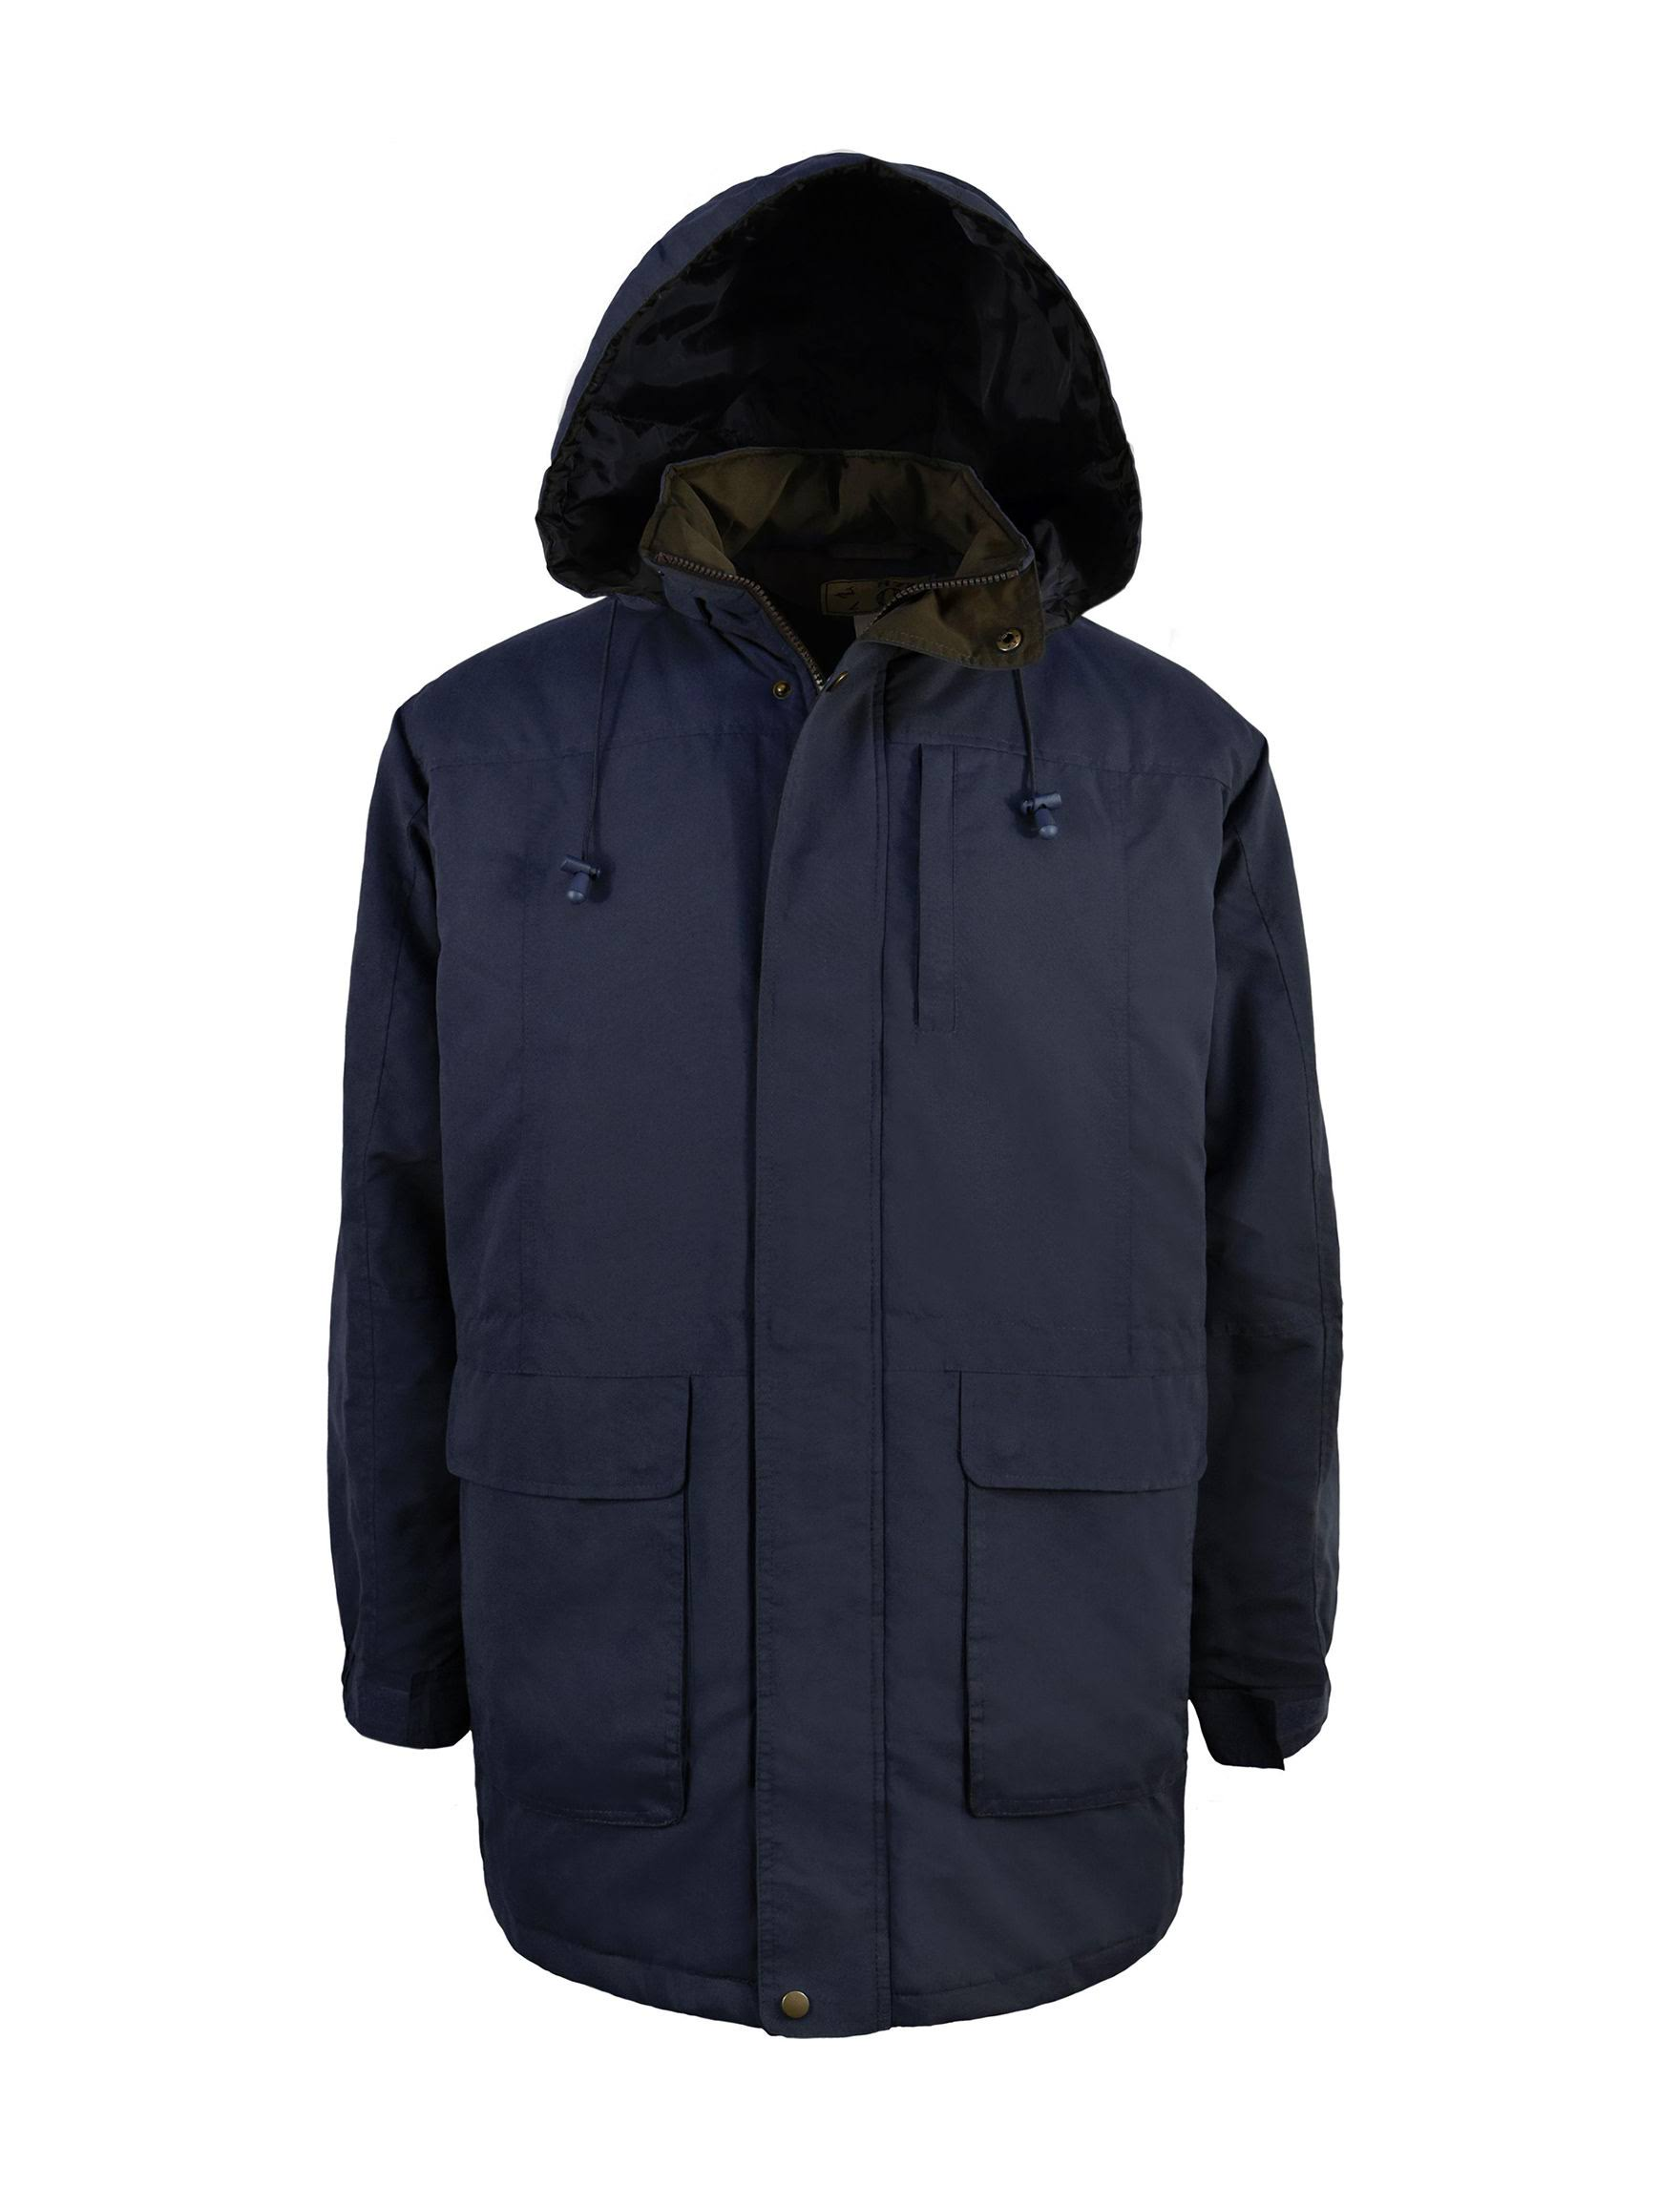 Acolchado Victoria extragrande Outfitters Y Con Parka Capucha Azul De Azul Para Forro Hombre Microfibra Marino qw6f46x8